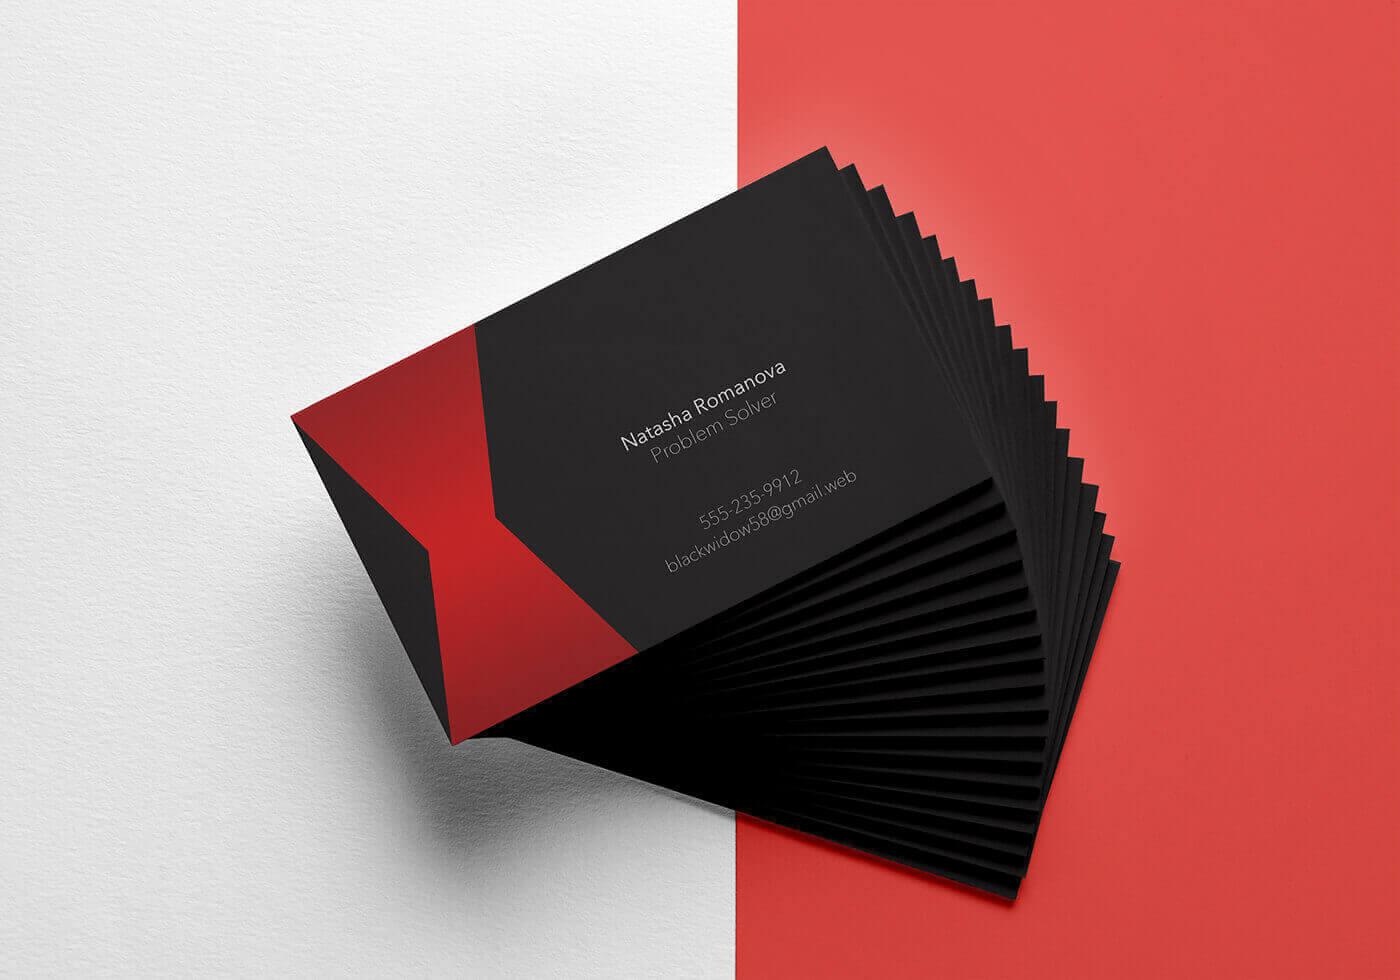 Наташа Романова (Черная Вдова) визитная карточка